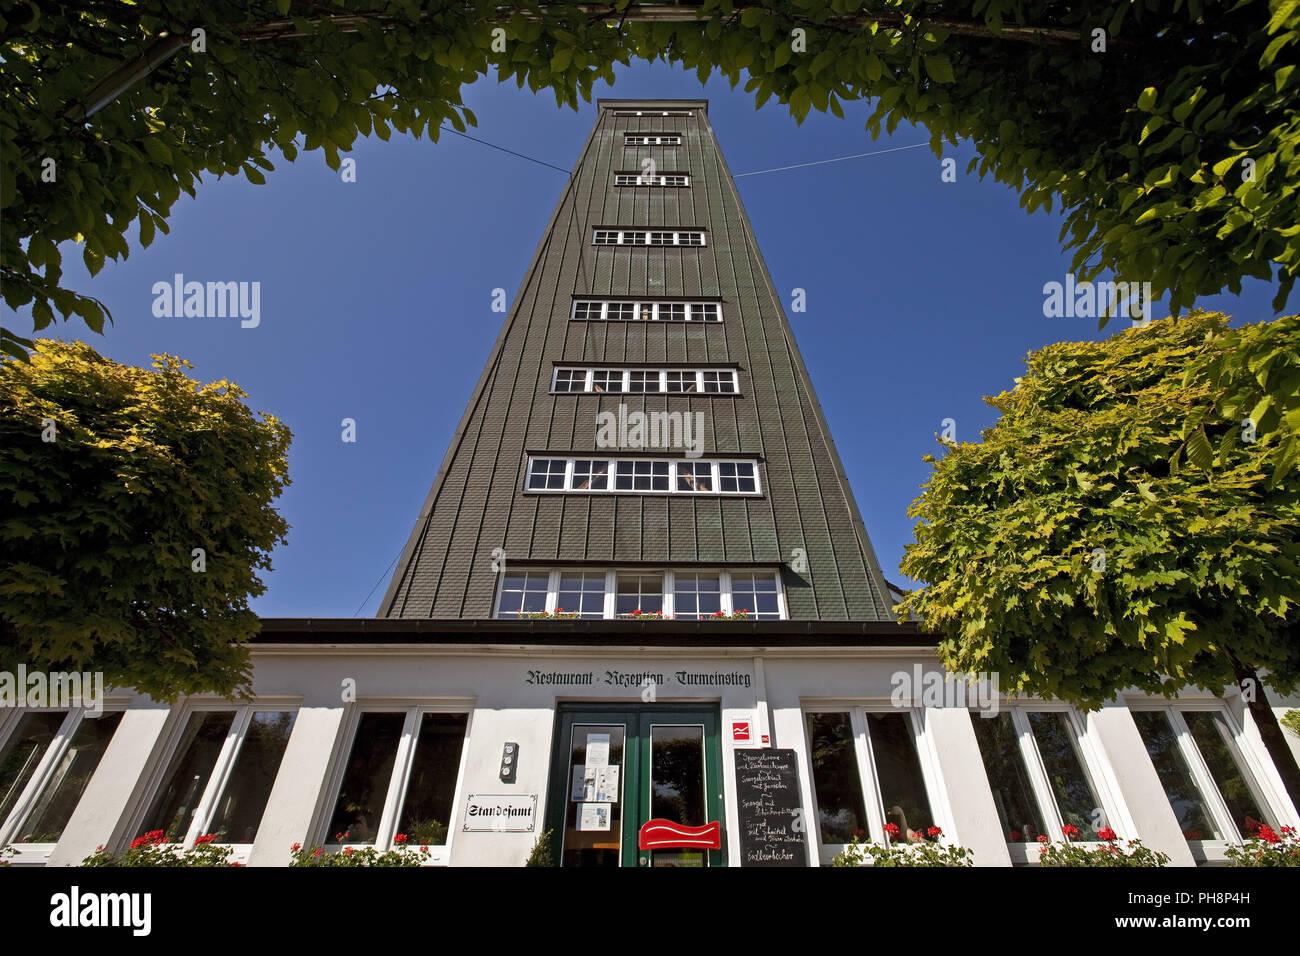 Rhein-Weser Tower, Kirchhundem, Germany Stock Photo